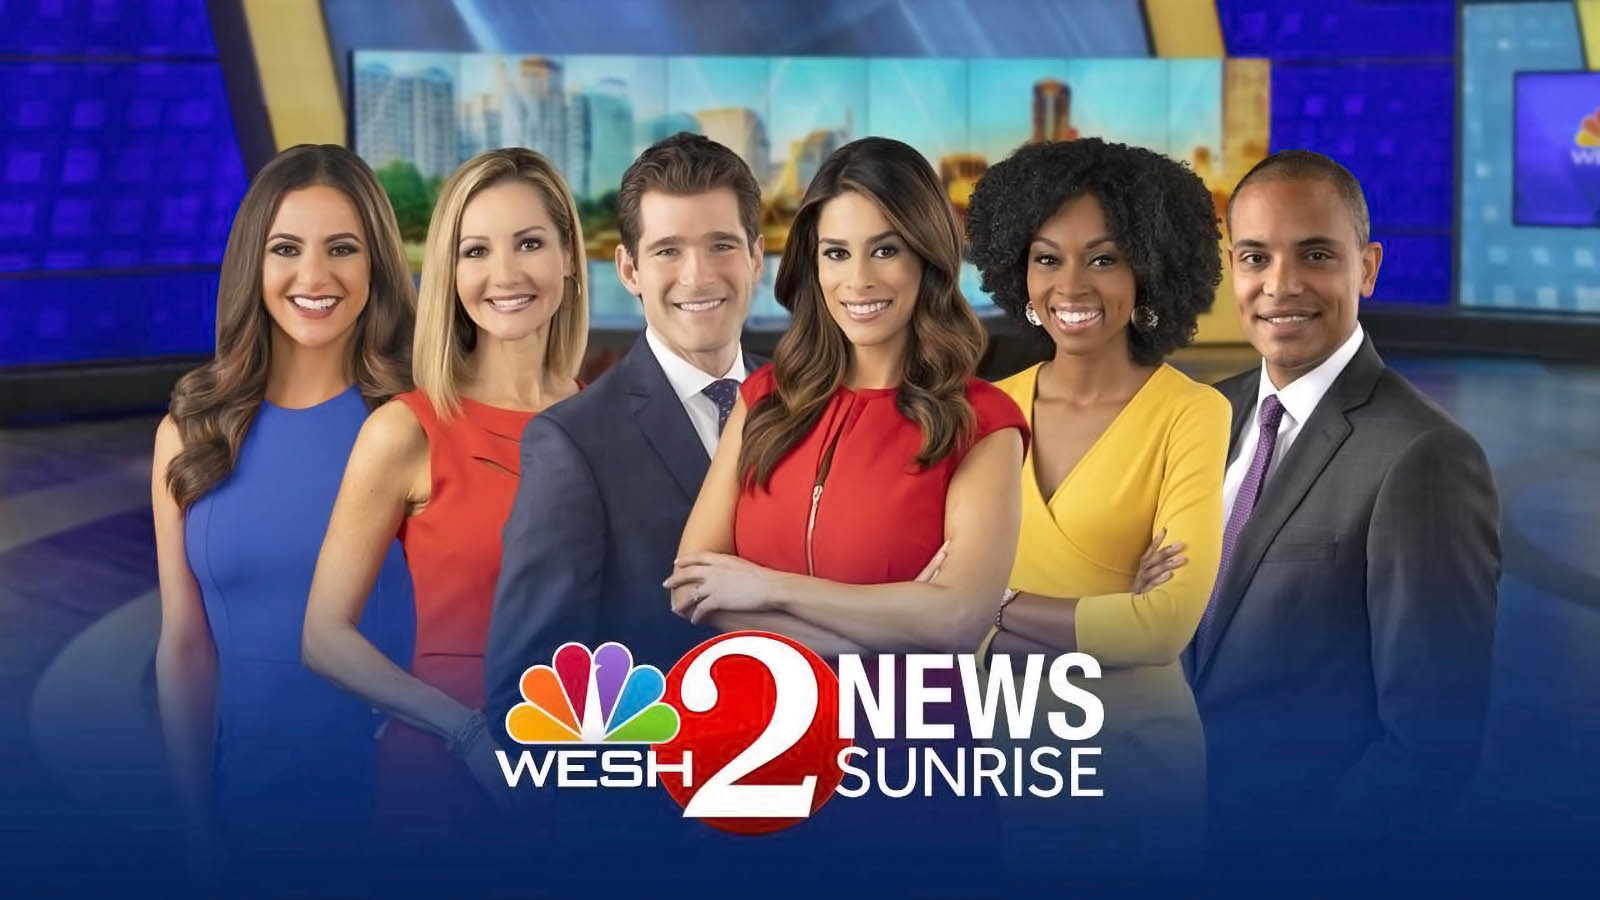 WESH 2 News Orlando sunrise team